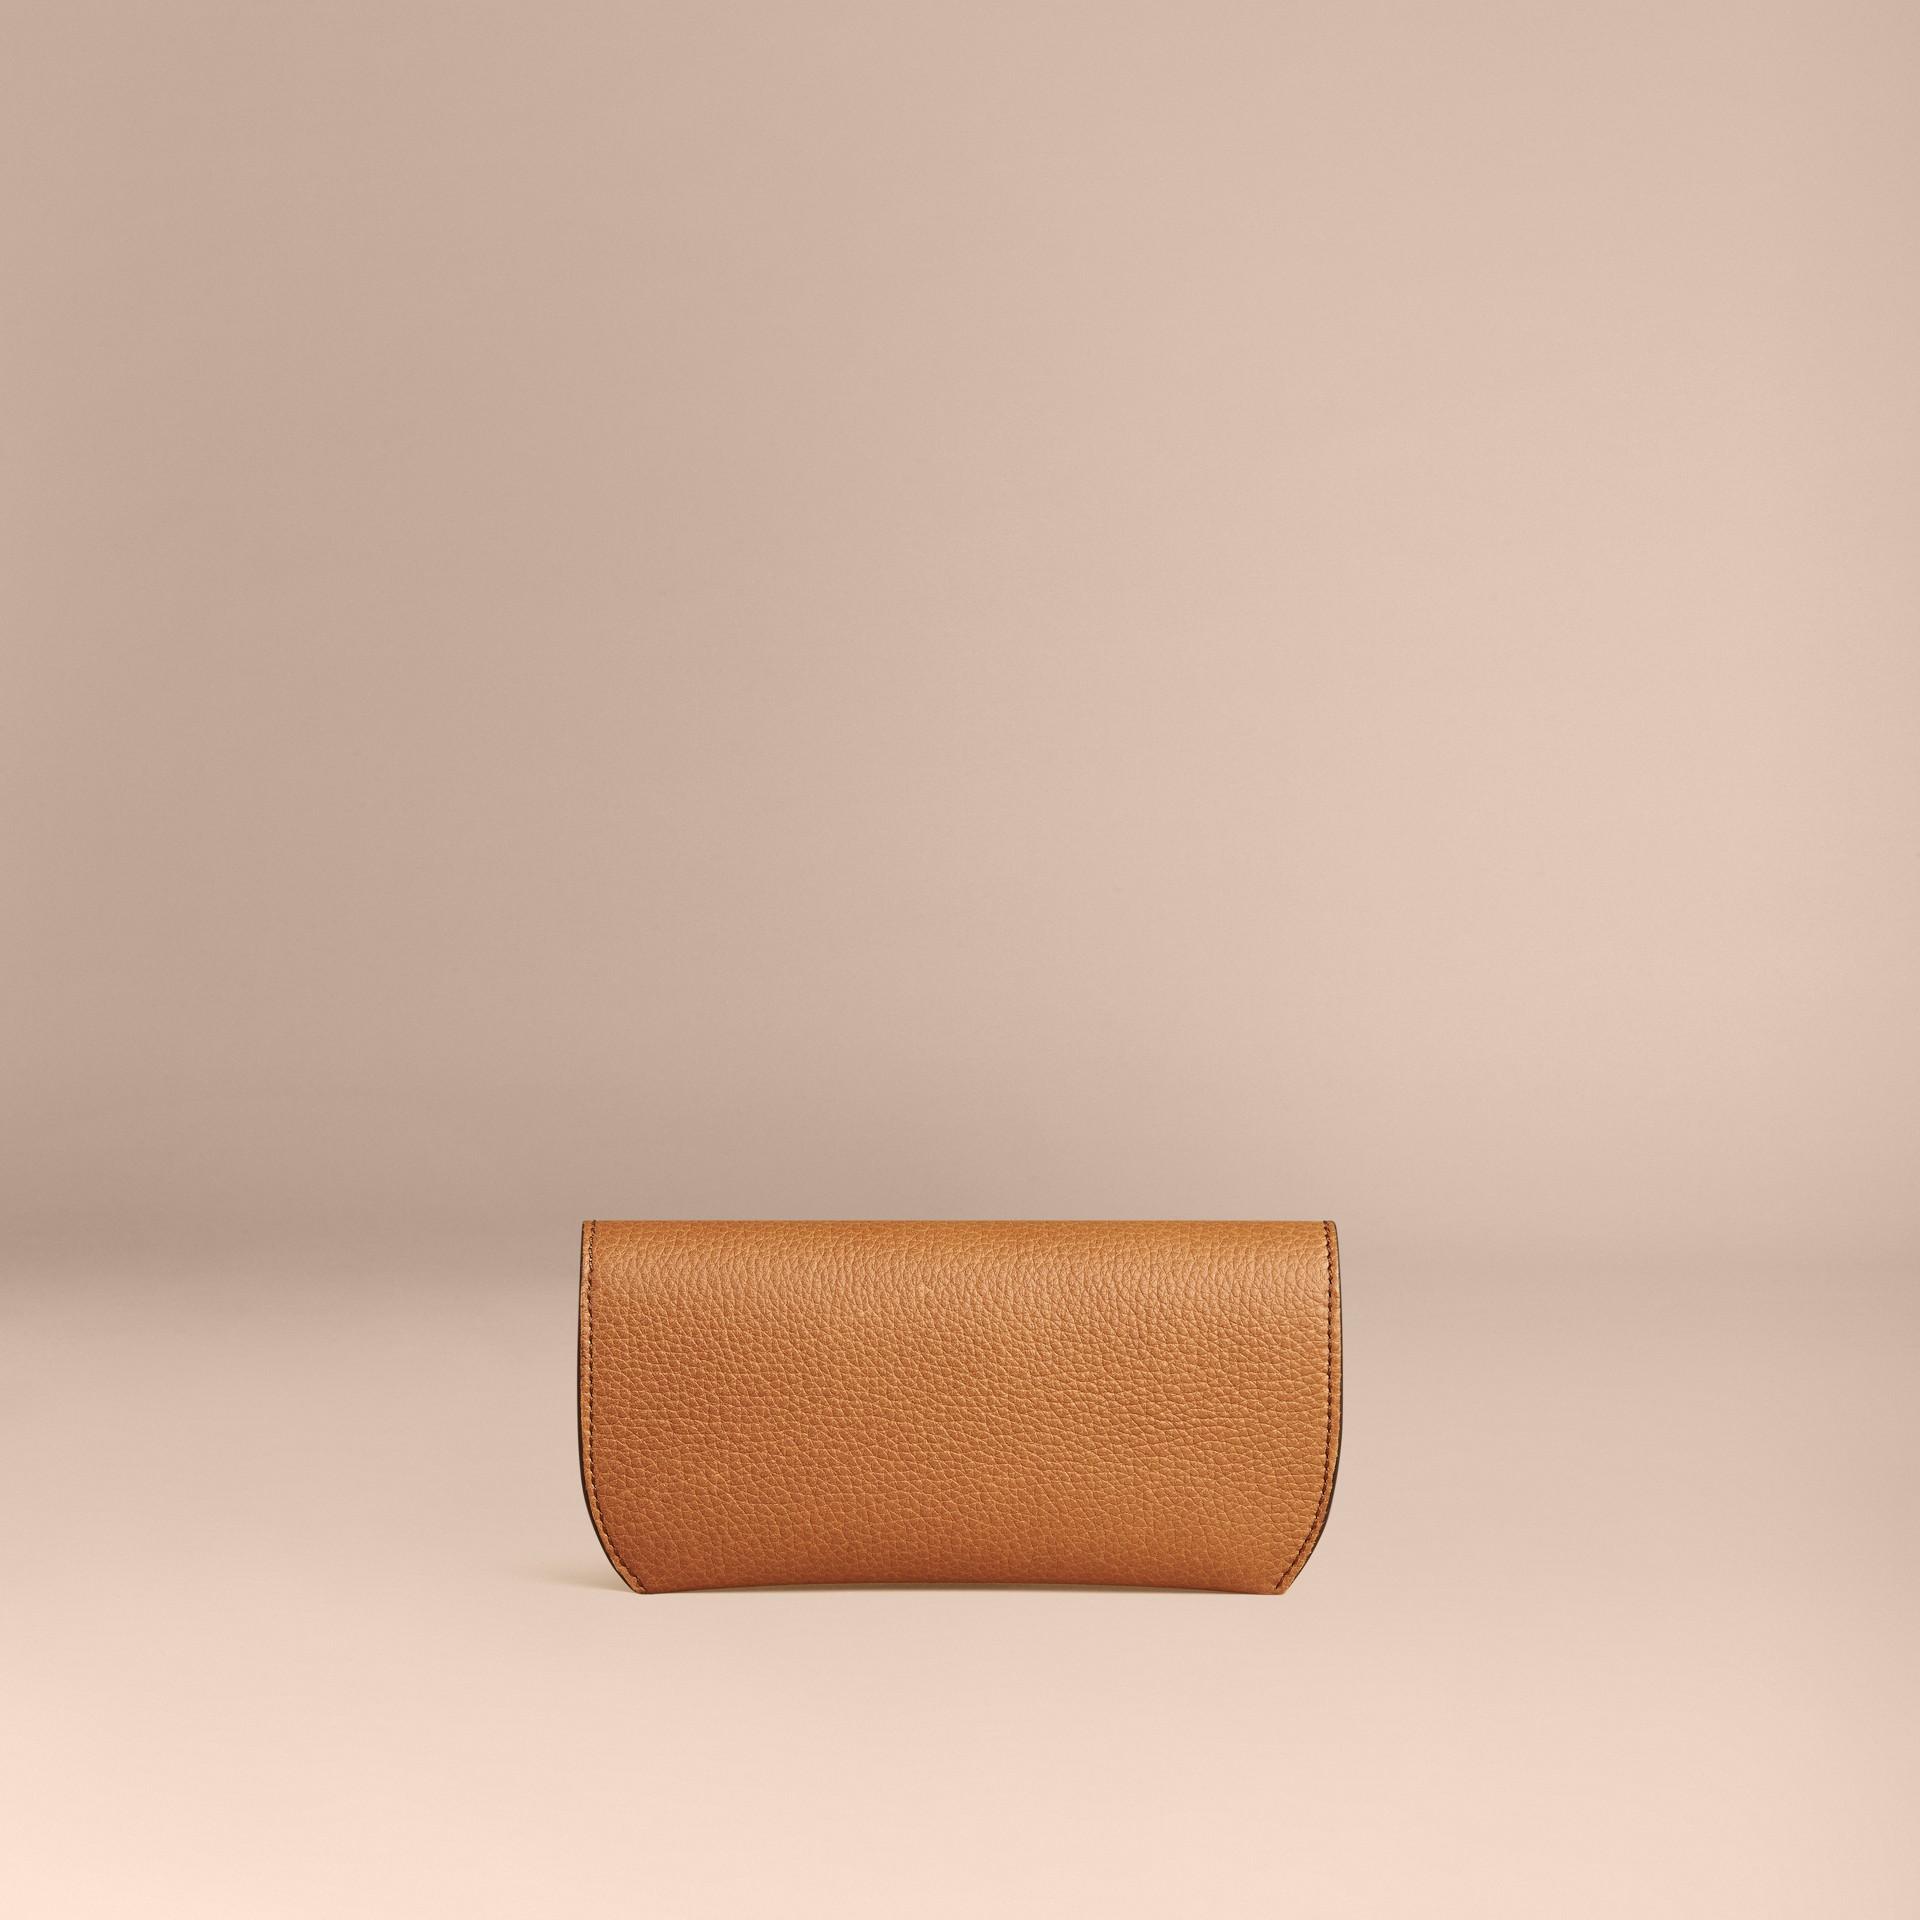 Tan Grainy Leather Eyewear Case Tan - gallery image 2